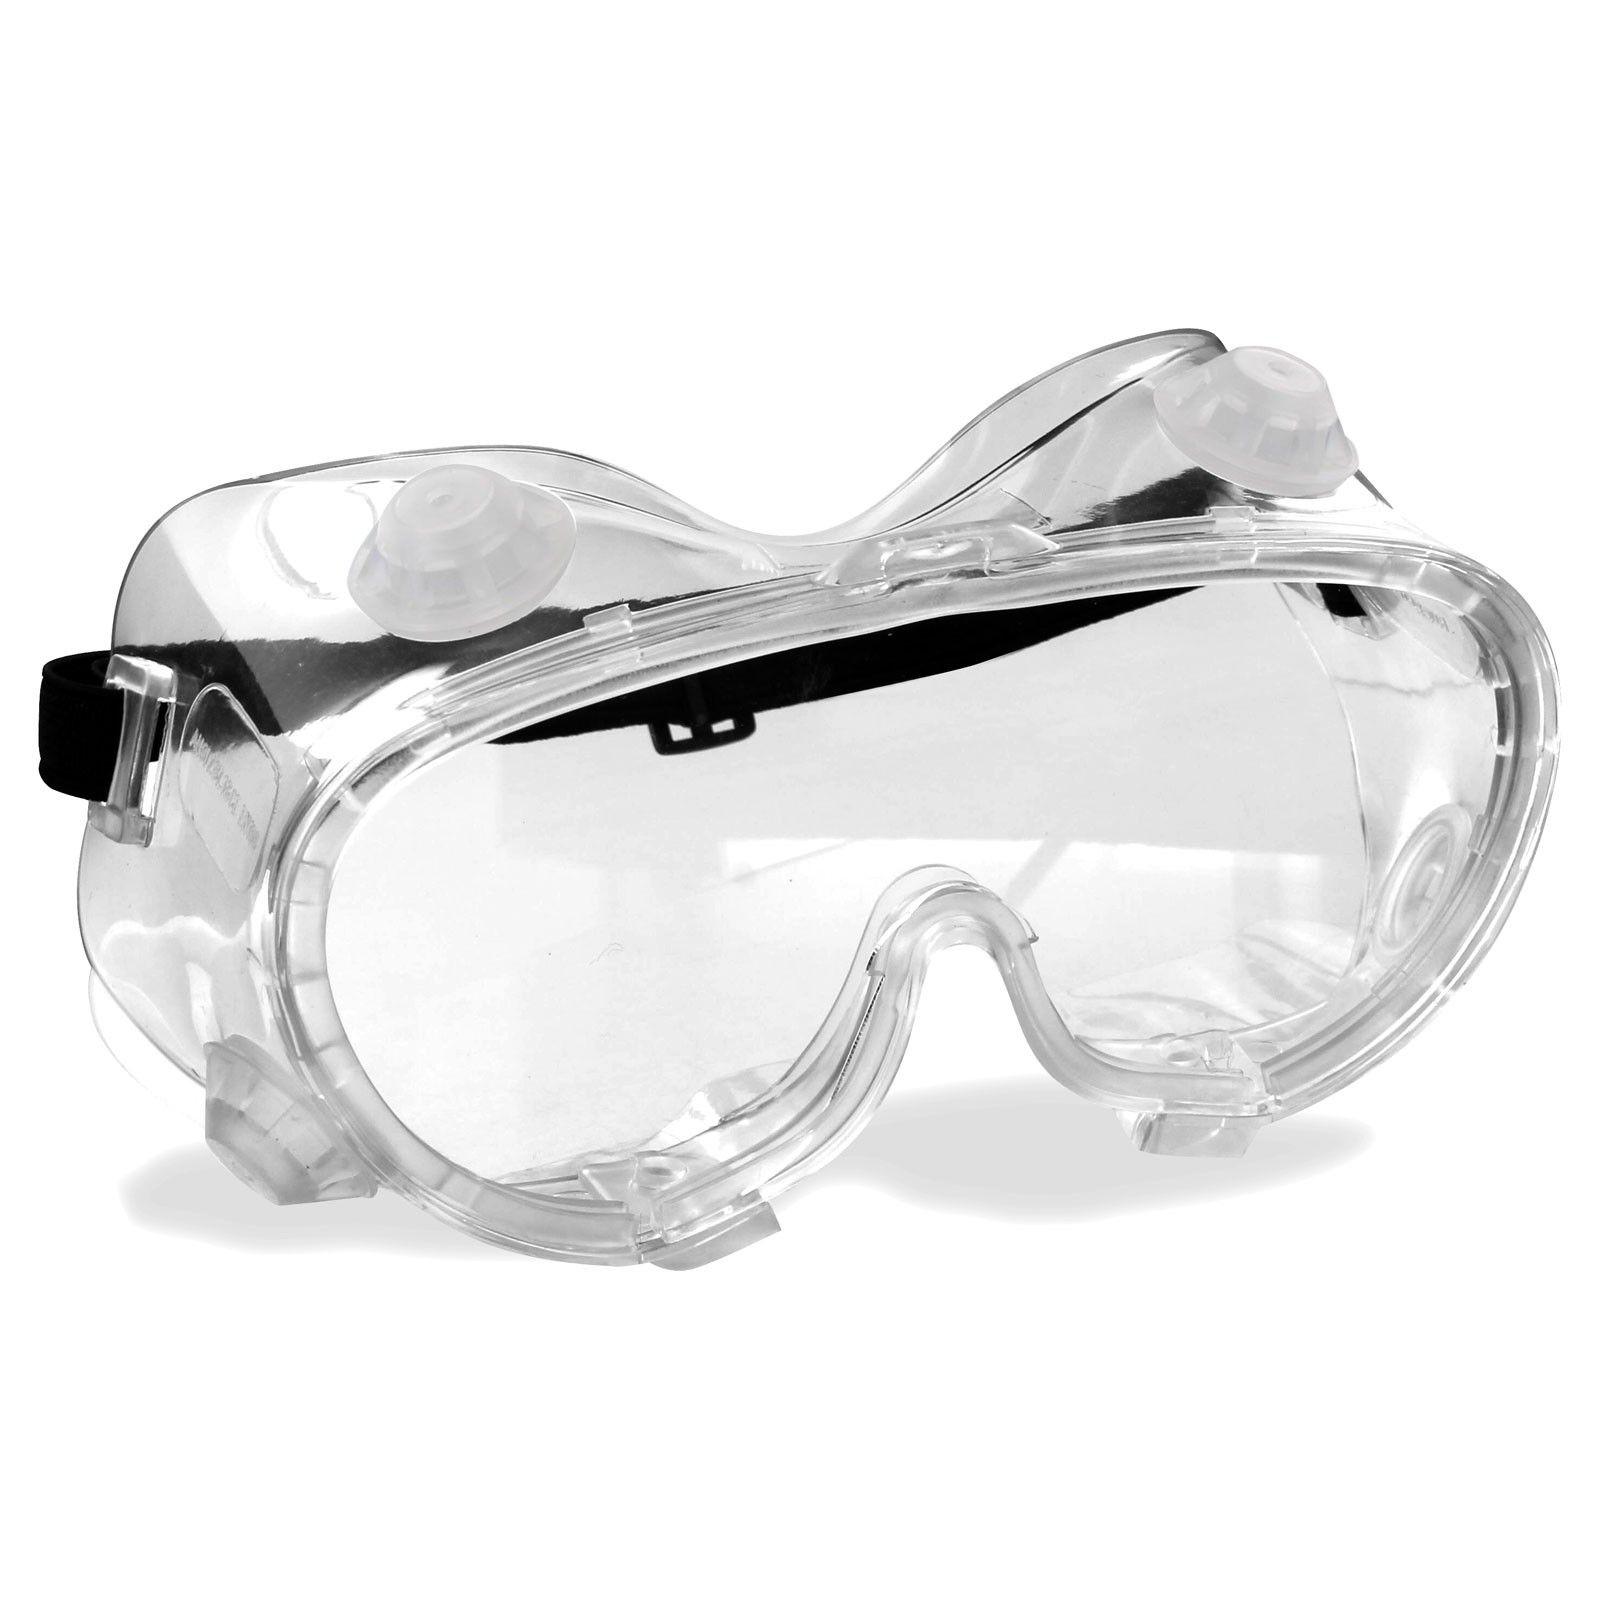 Rugged Blue Economy Safety Goggles Eyewear, Eye